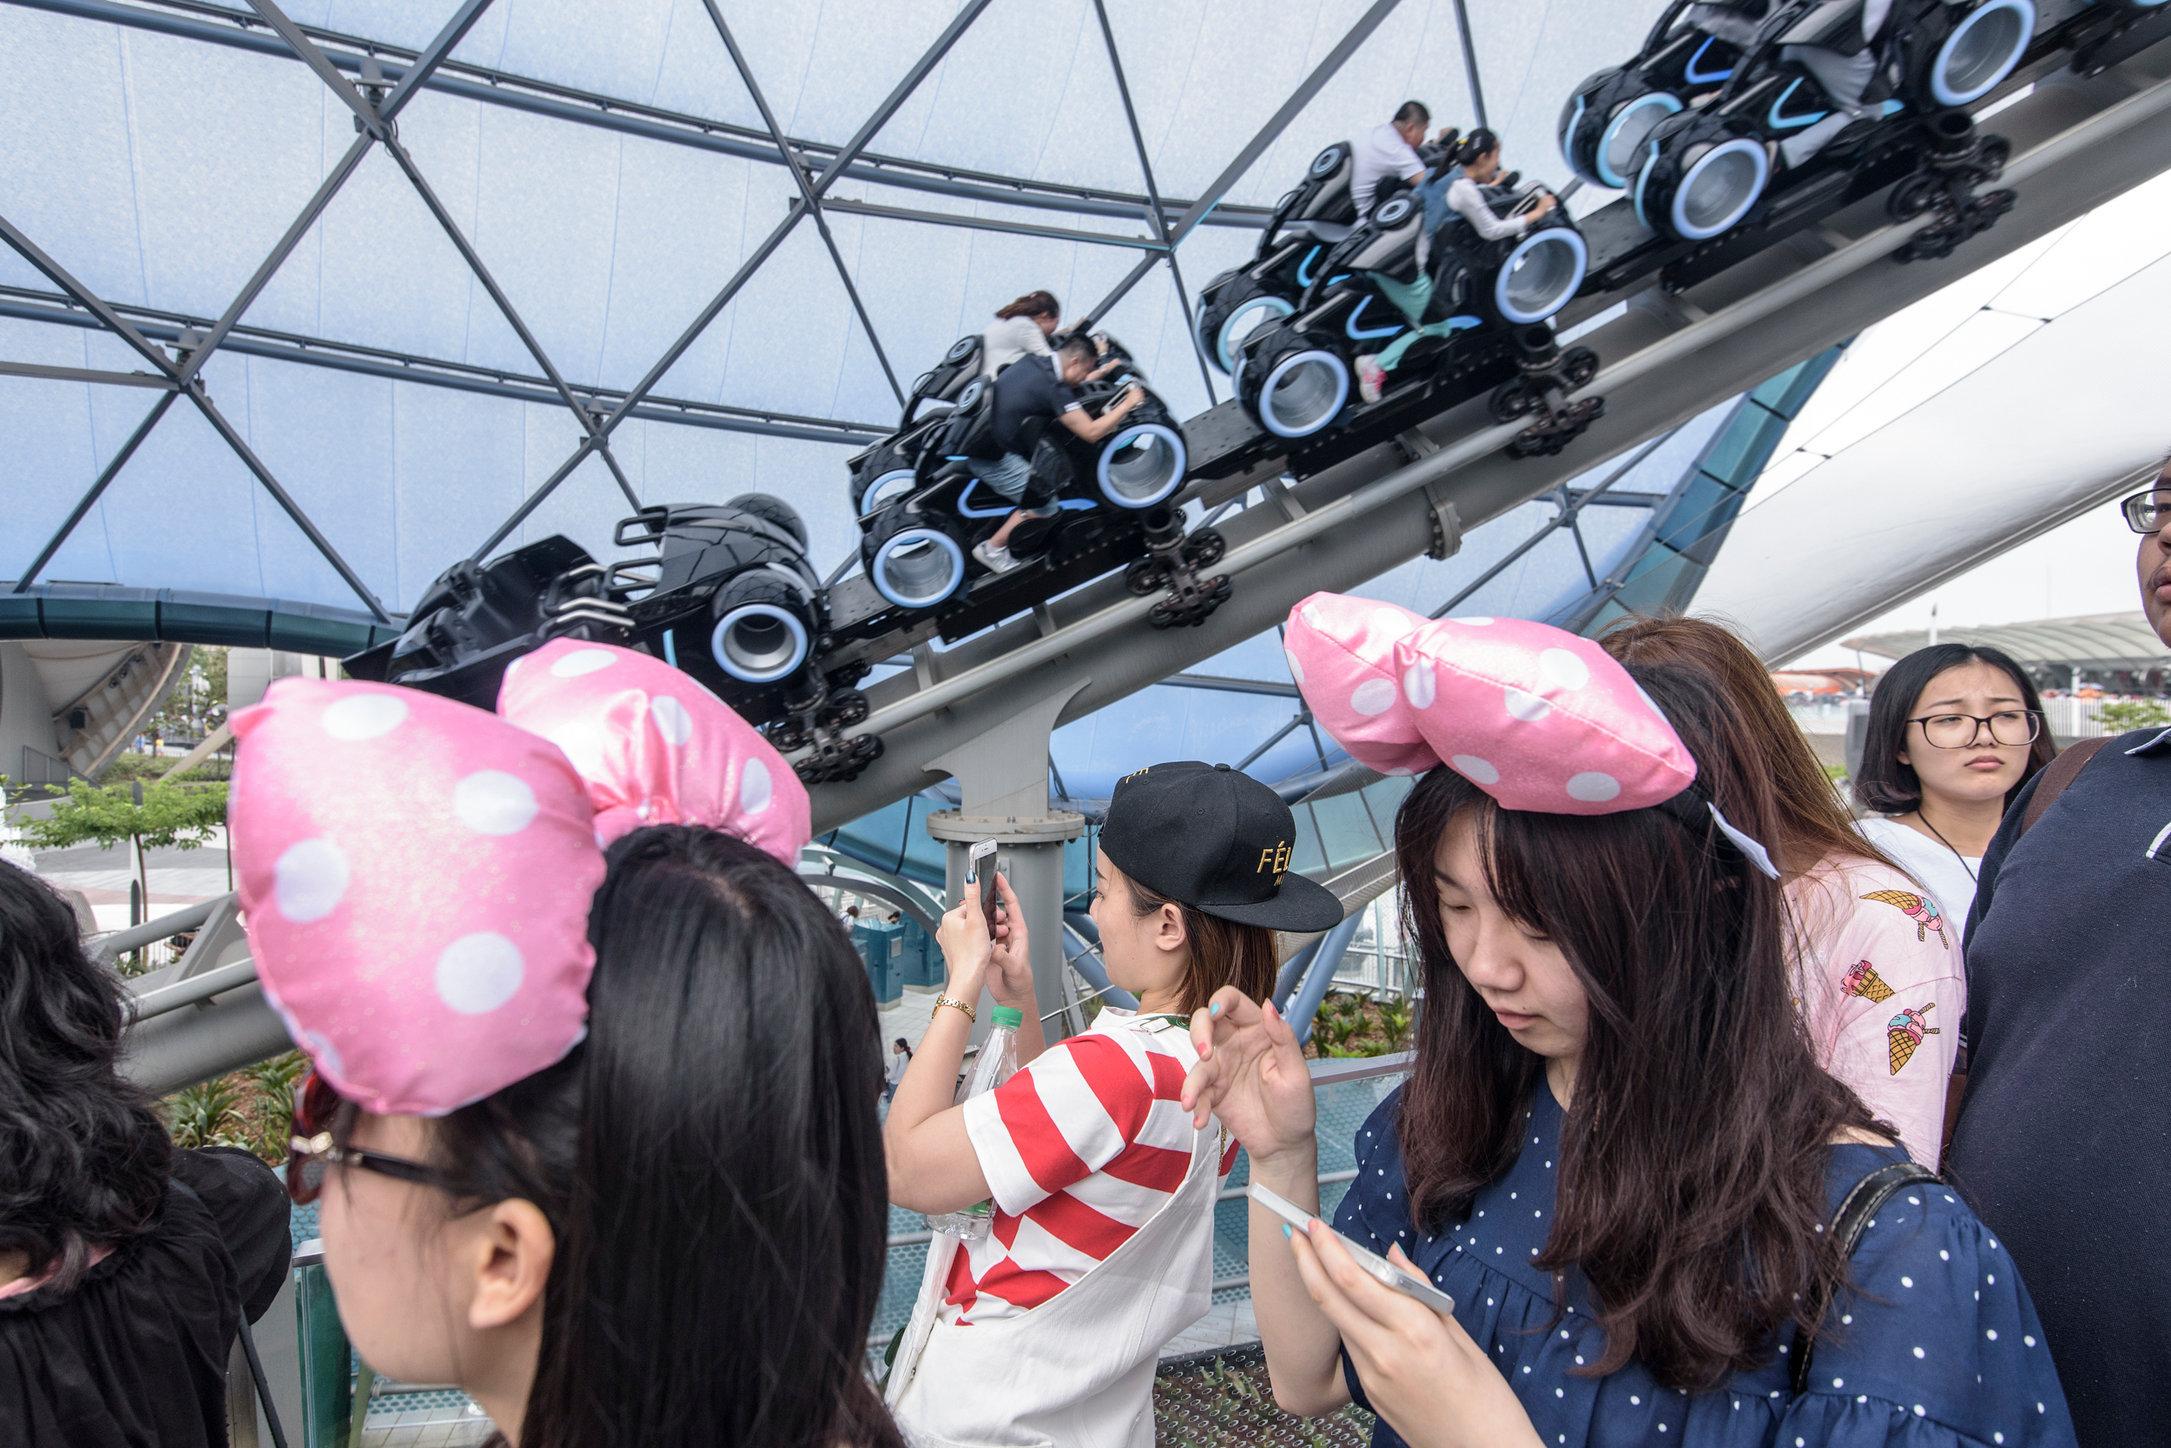 DisneylandShanghai0010.jpg